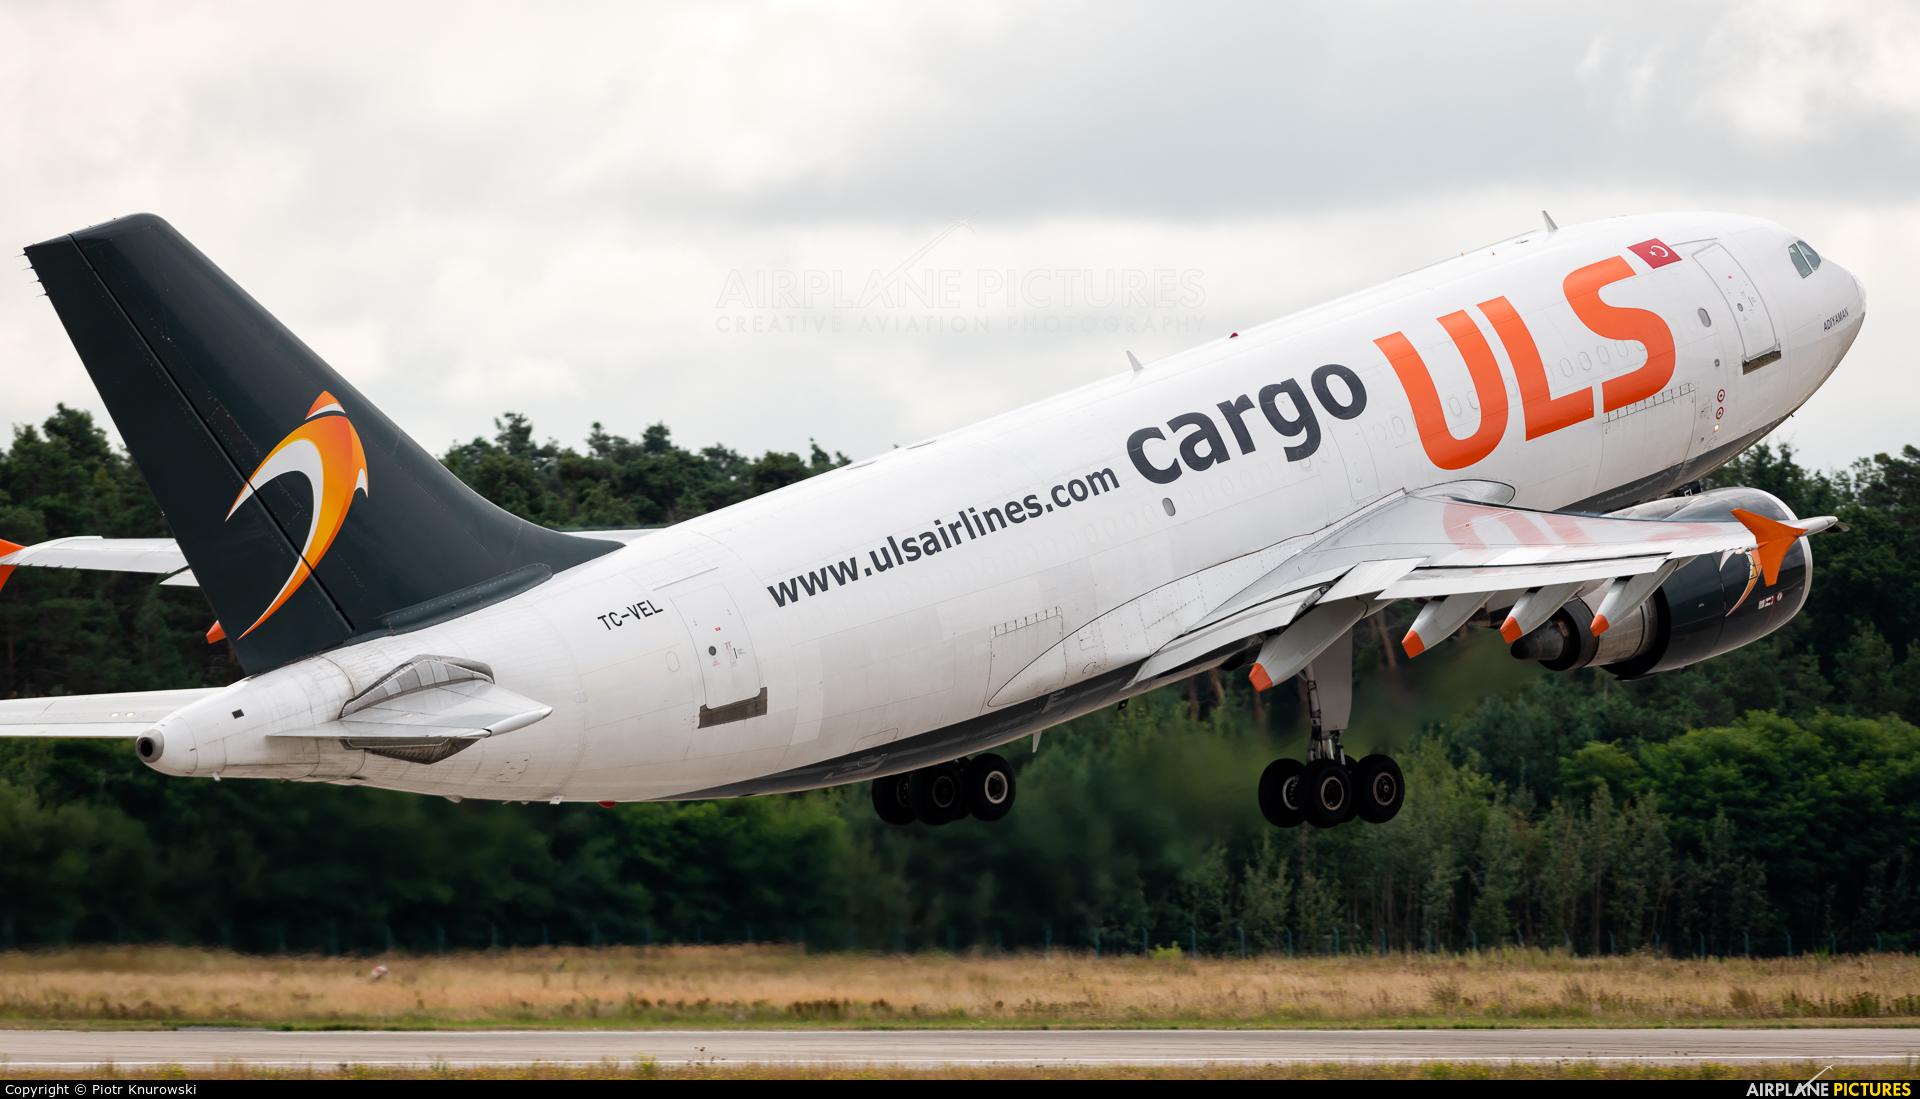 ULS Cargo TC-VEL aircraft at Frankfurt